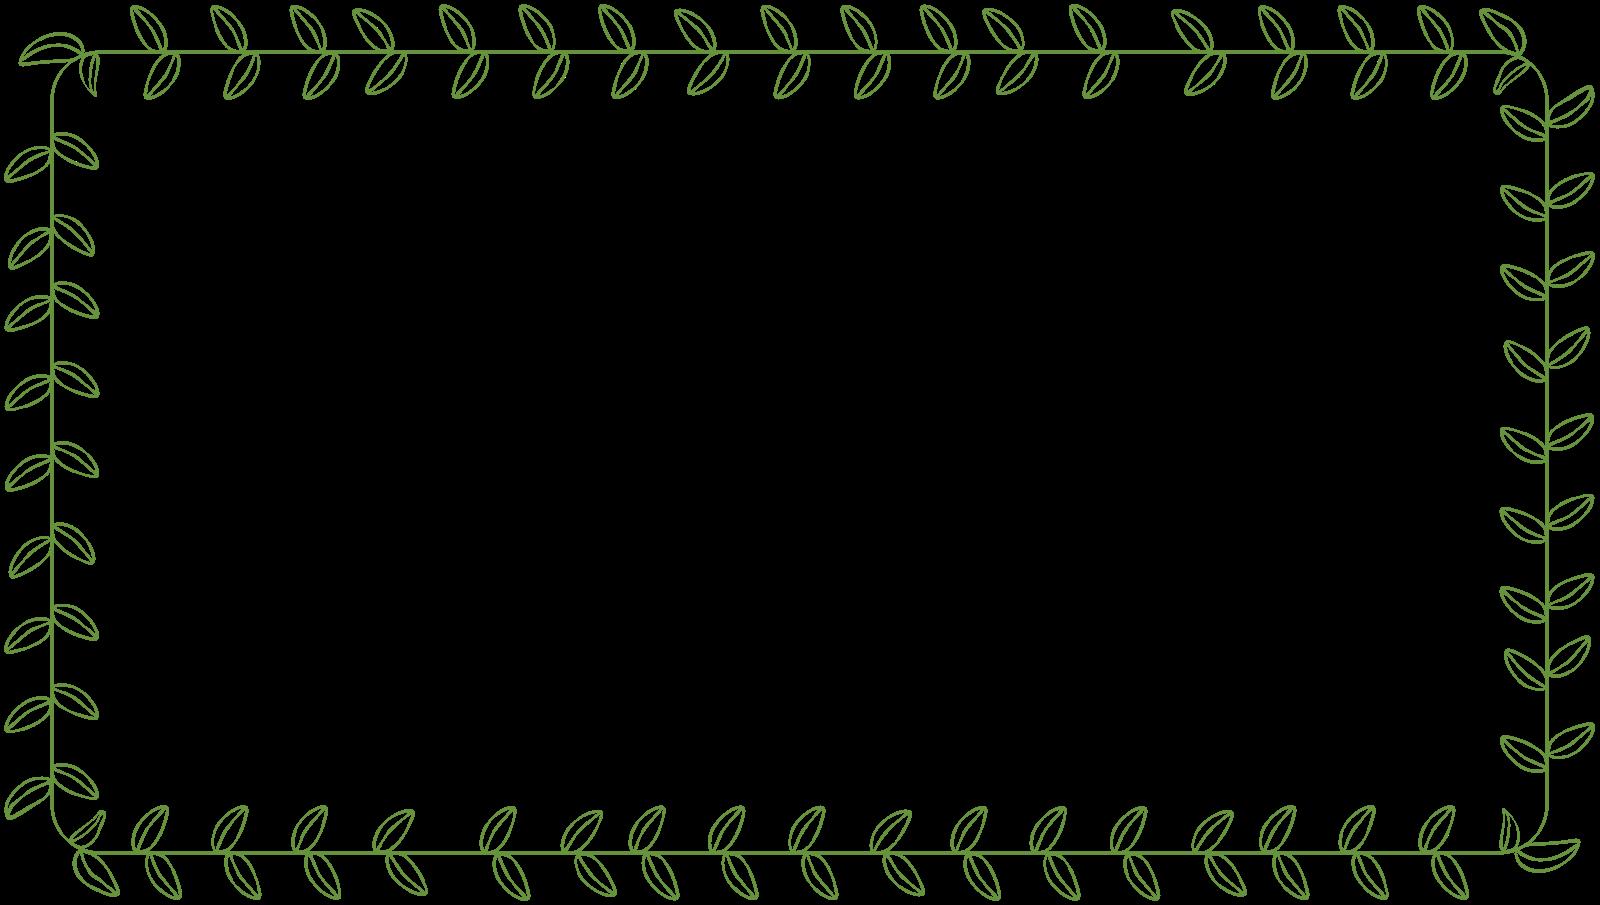 Coupon clipart border. Free laurel frames arrows